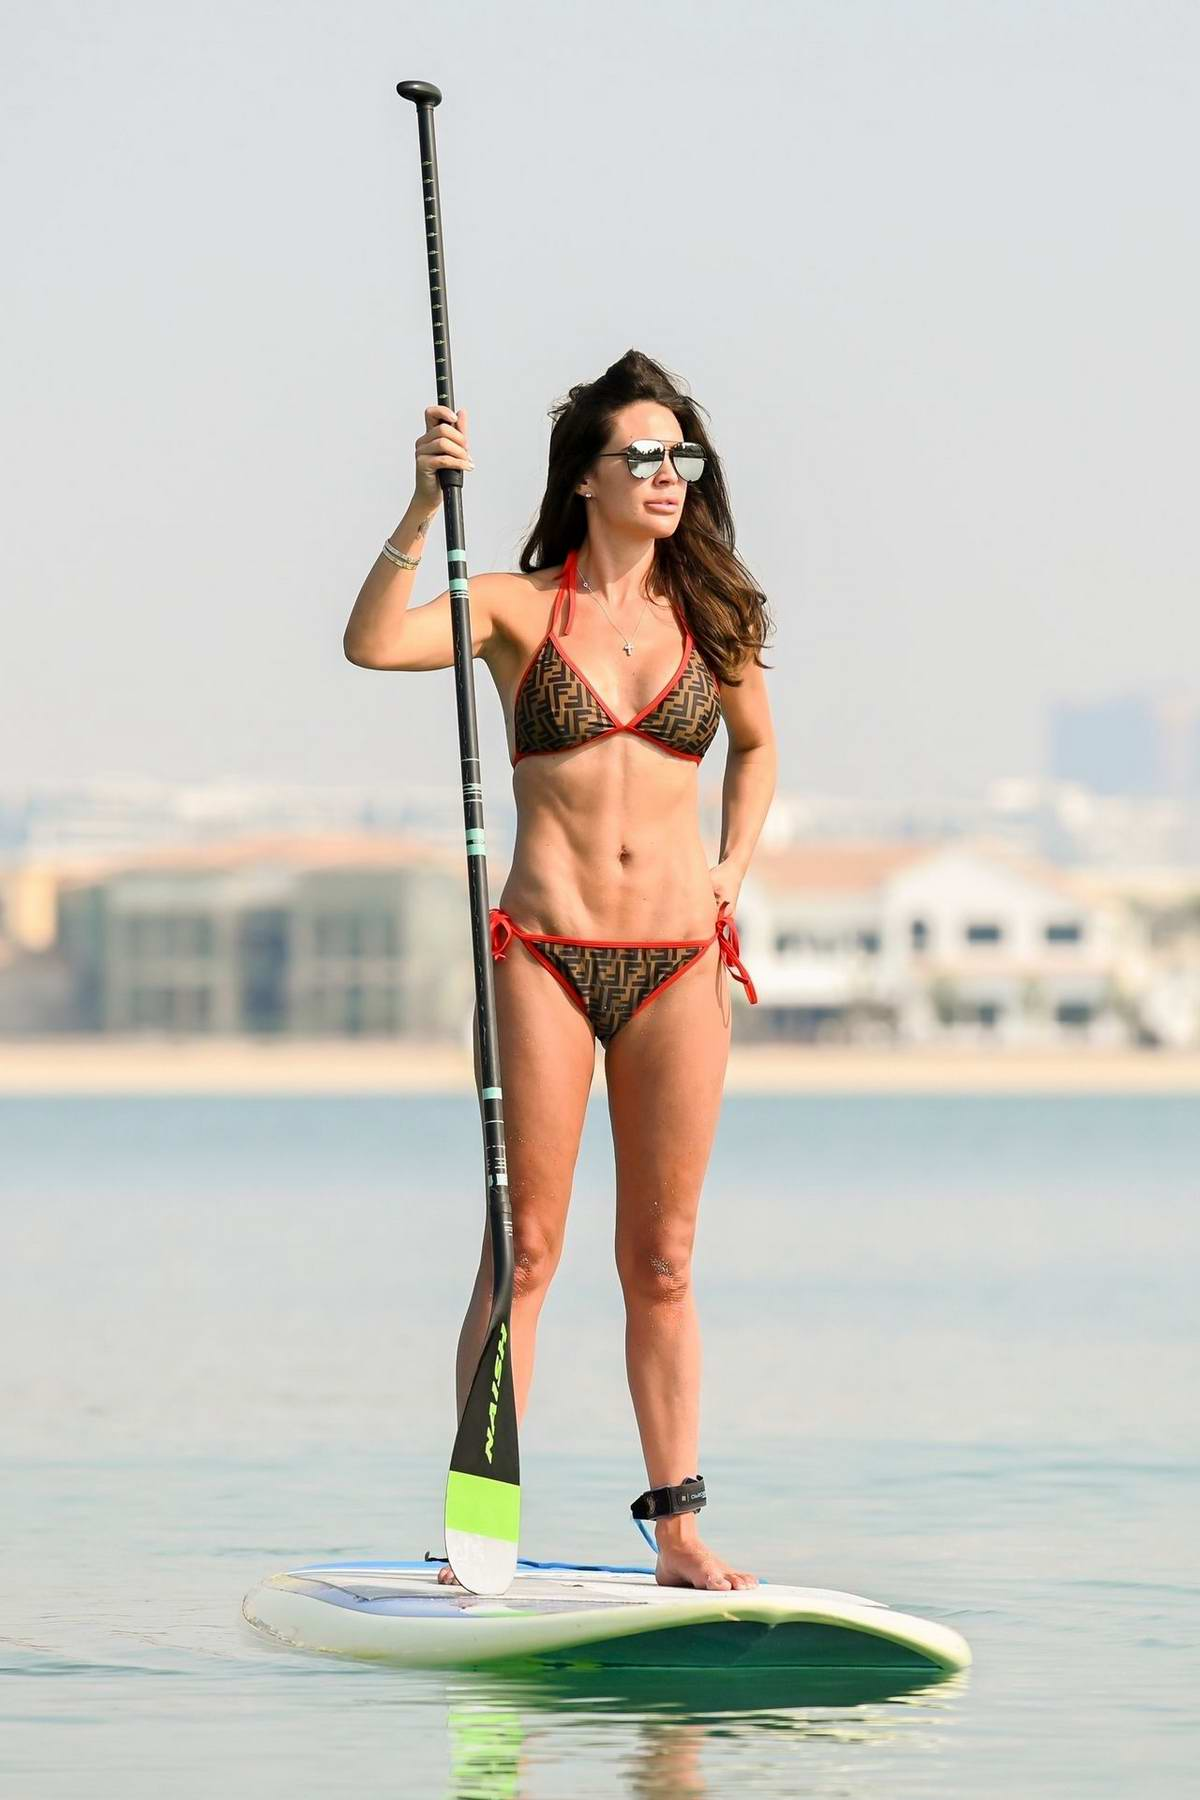 Danielle Lloyd seen wearing a FENDI bikini while paddle boarding in the sea in Dubai, UAE